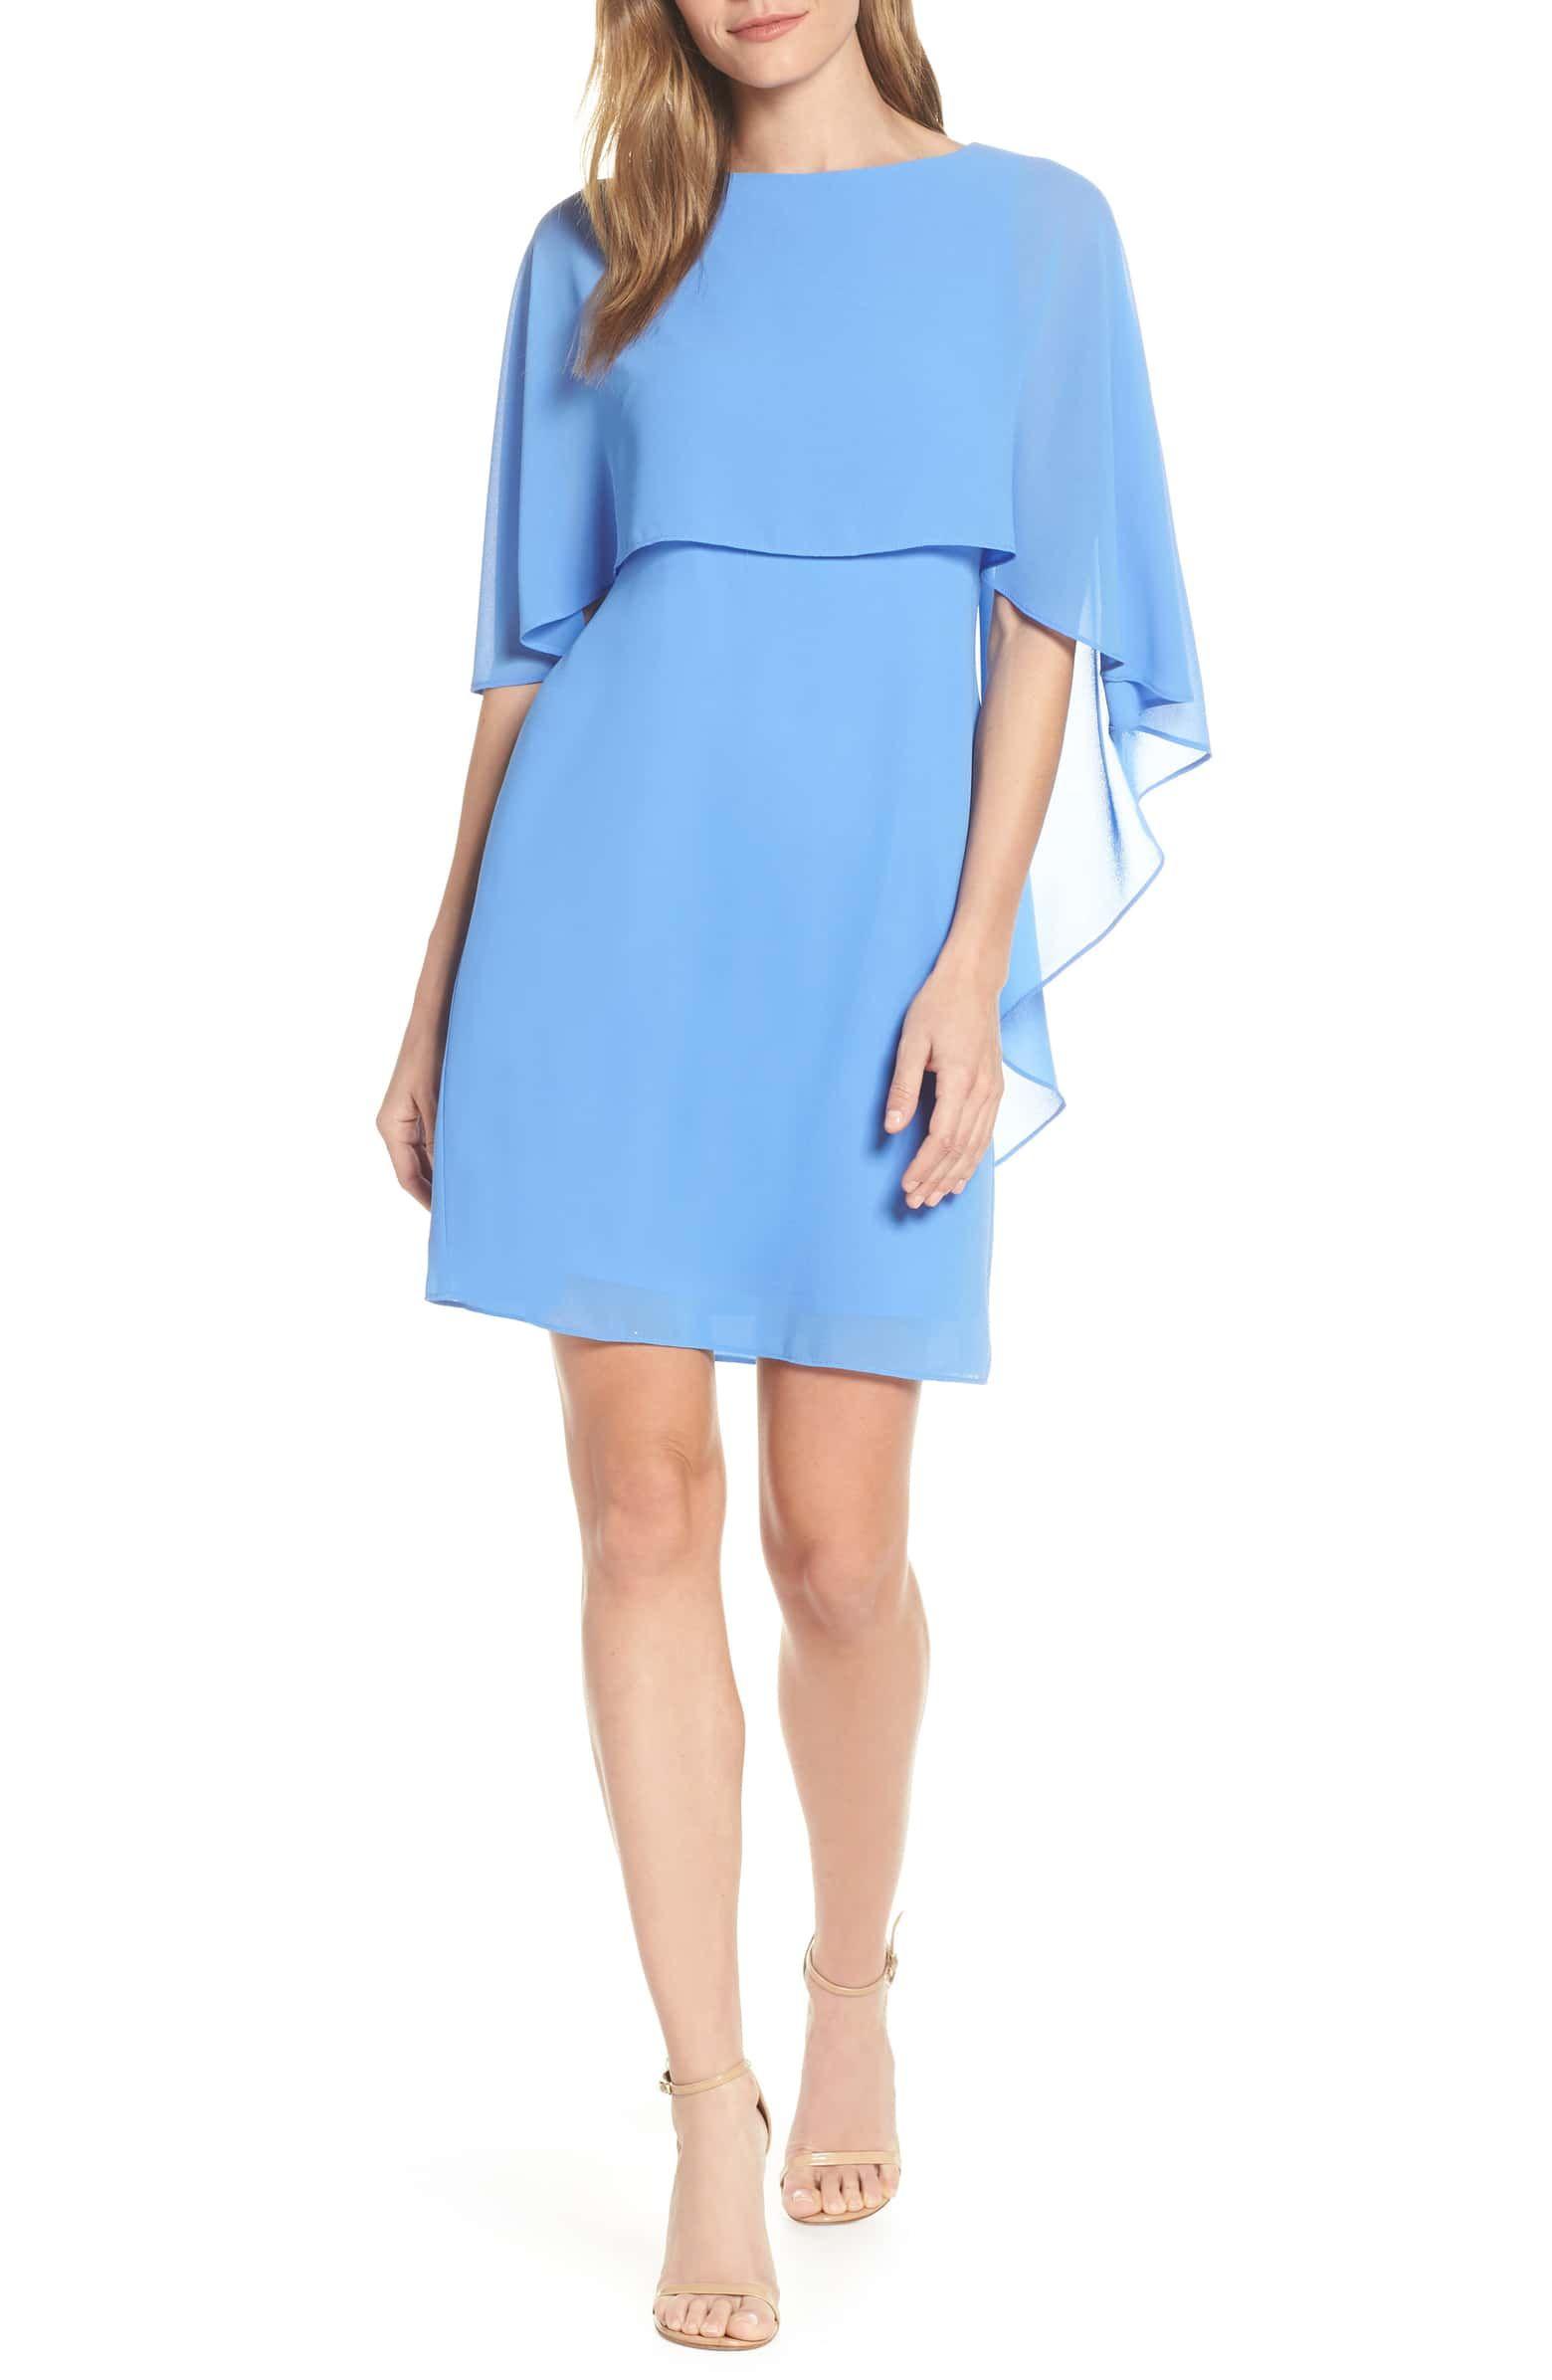 Vince Camuto Chiffon Cape Cocktail Dress Nordstrom Overlay Dress Trendy Cocktail Dresses Sleek Dress [ 2392 x 1560 Pixel ]